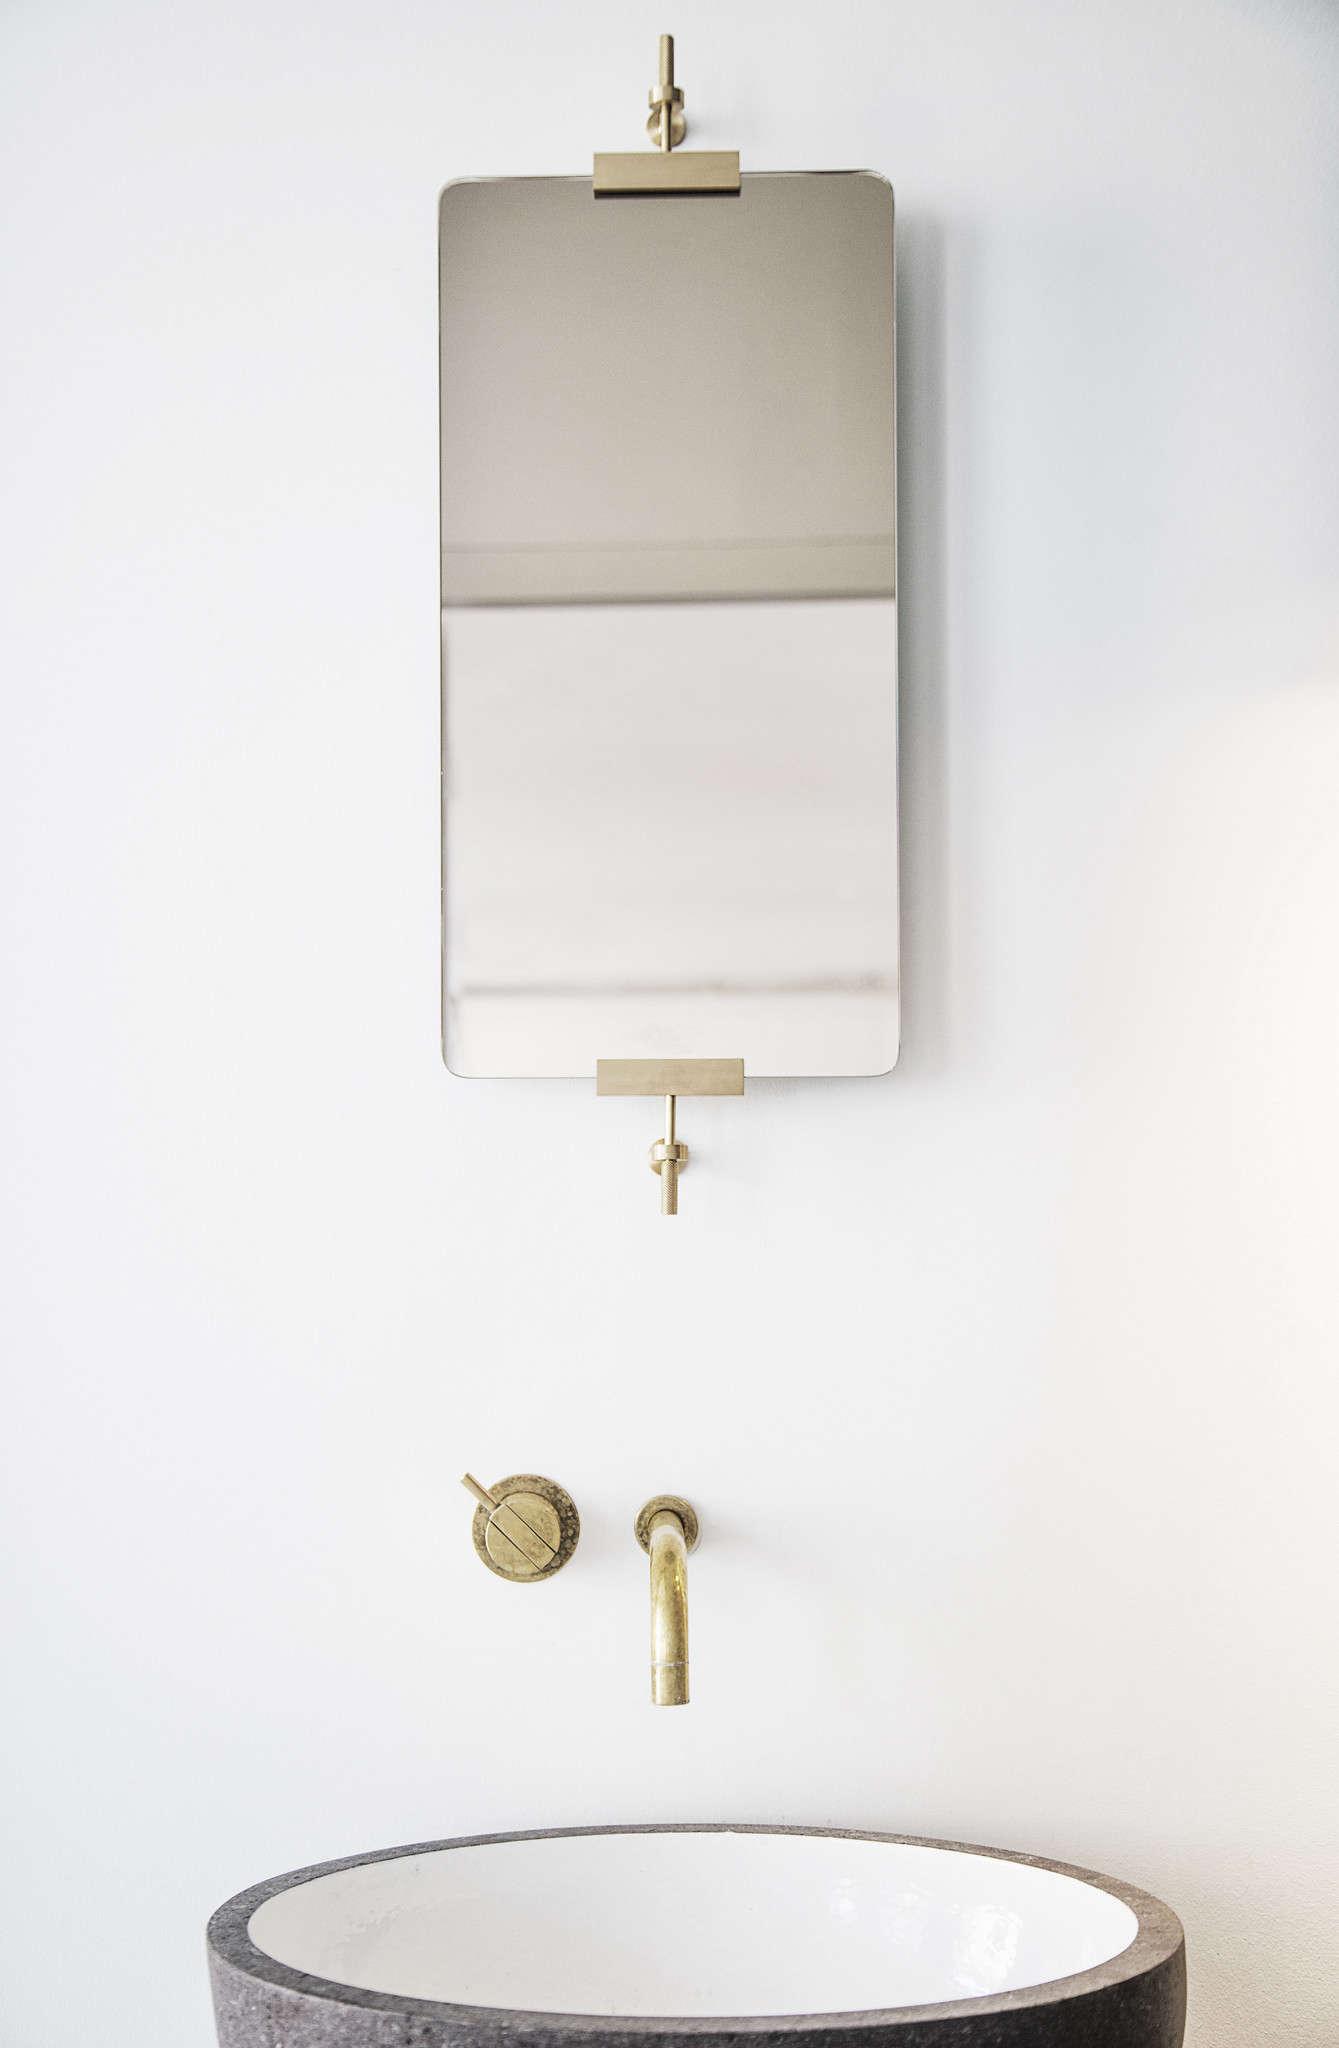 ArtisanDesigned Light Fixtures and Hardware from Copenhagen kbh kobenhavns mobelsnedkeri mirror remodelista 2